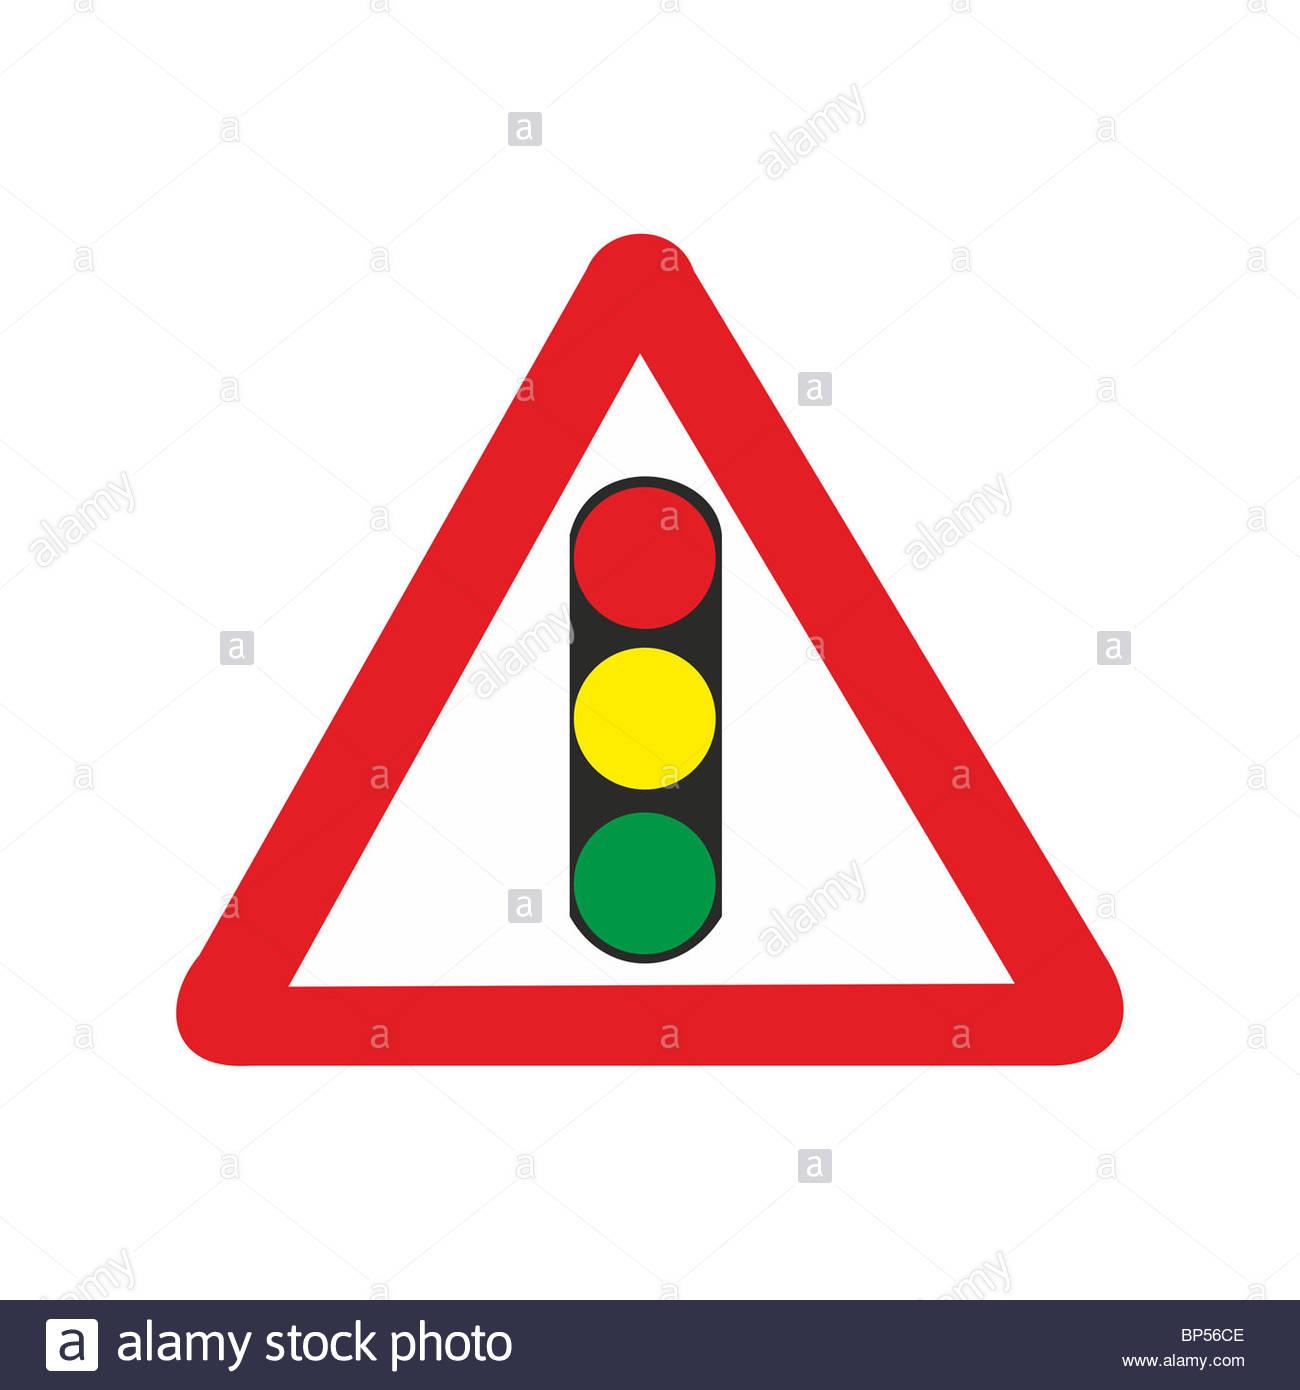 1300x1390 Uk Road Sign Ramp Temporary Traffic Lights Light Signals Signal